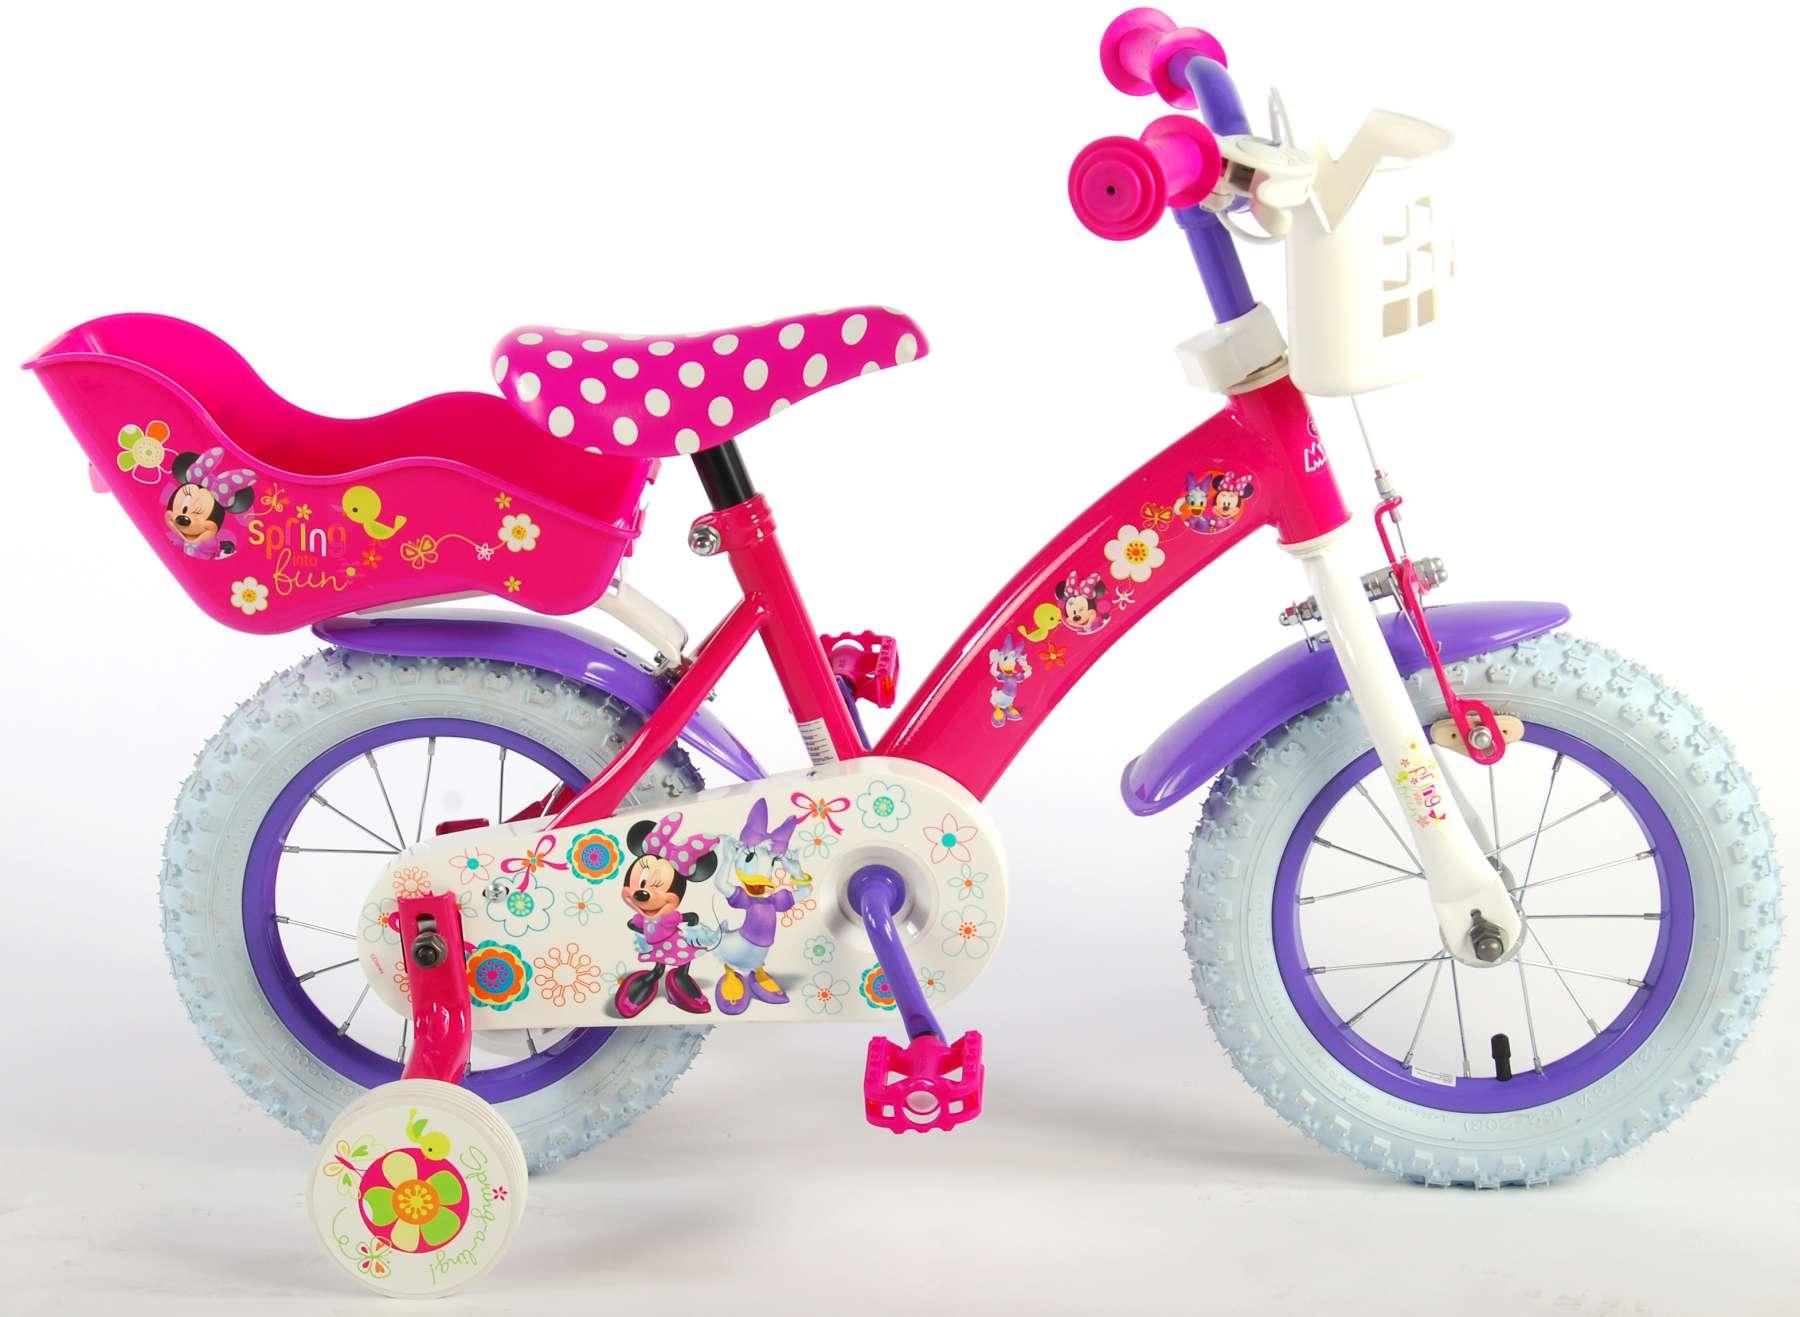 Bicicleta Minnie Bow-Tique 12 pulgadas